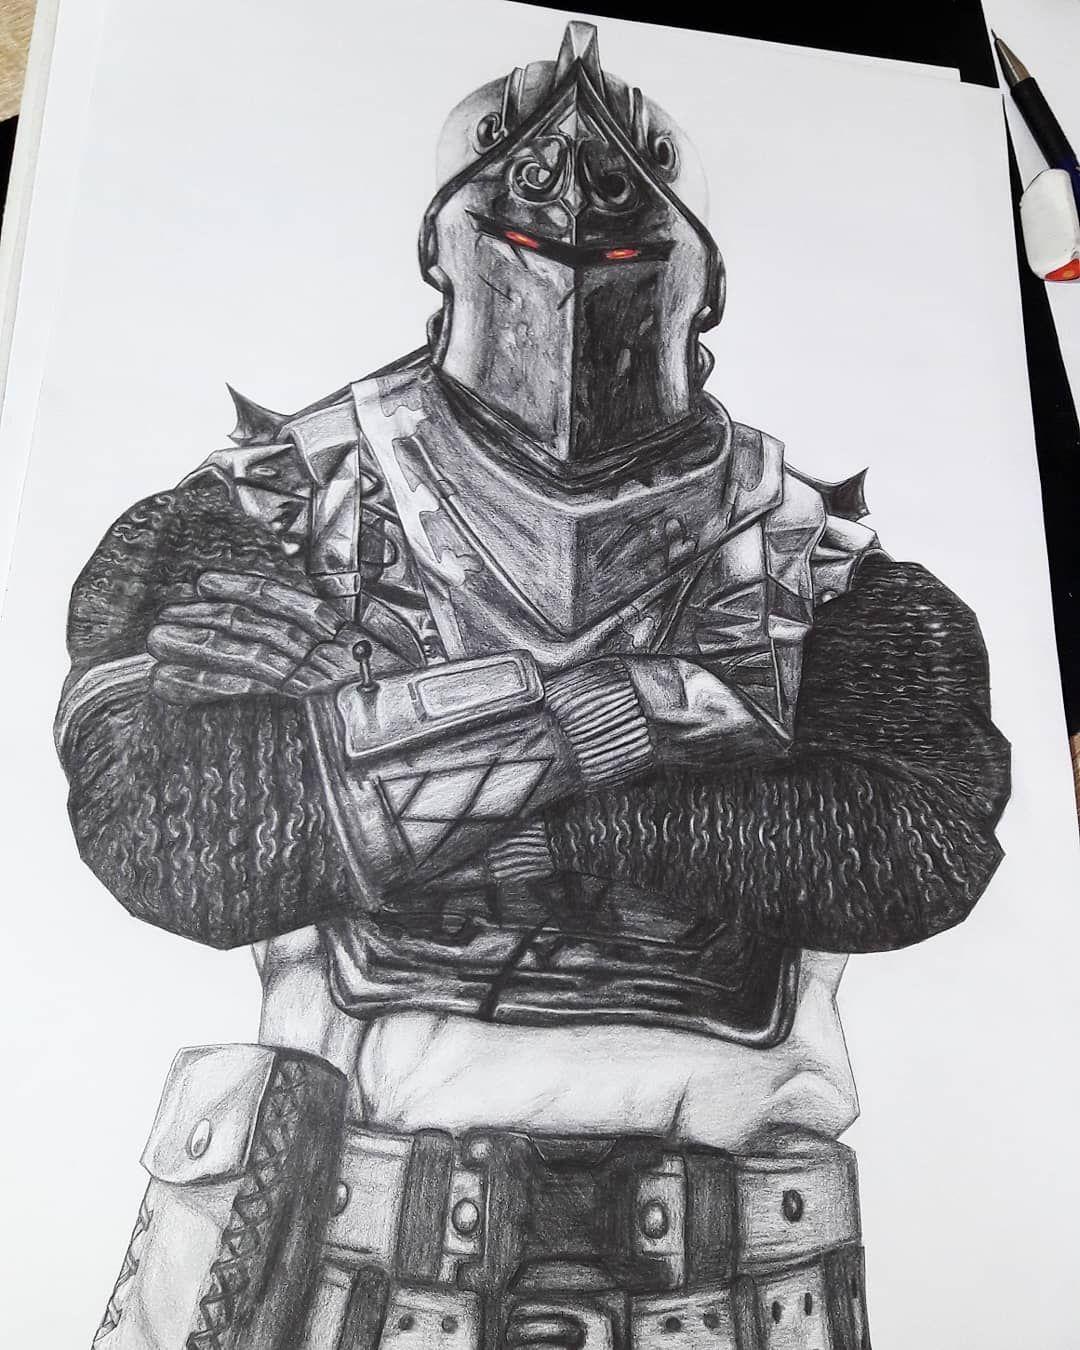 Fortnite Drawings: I Drawed The BLACK KNIGHT From Fortnite Hope You Guys Like